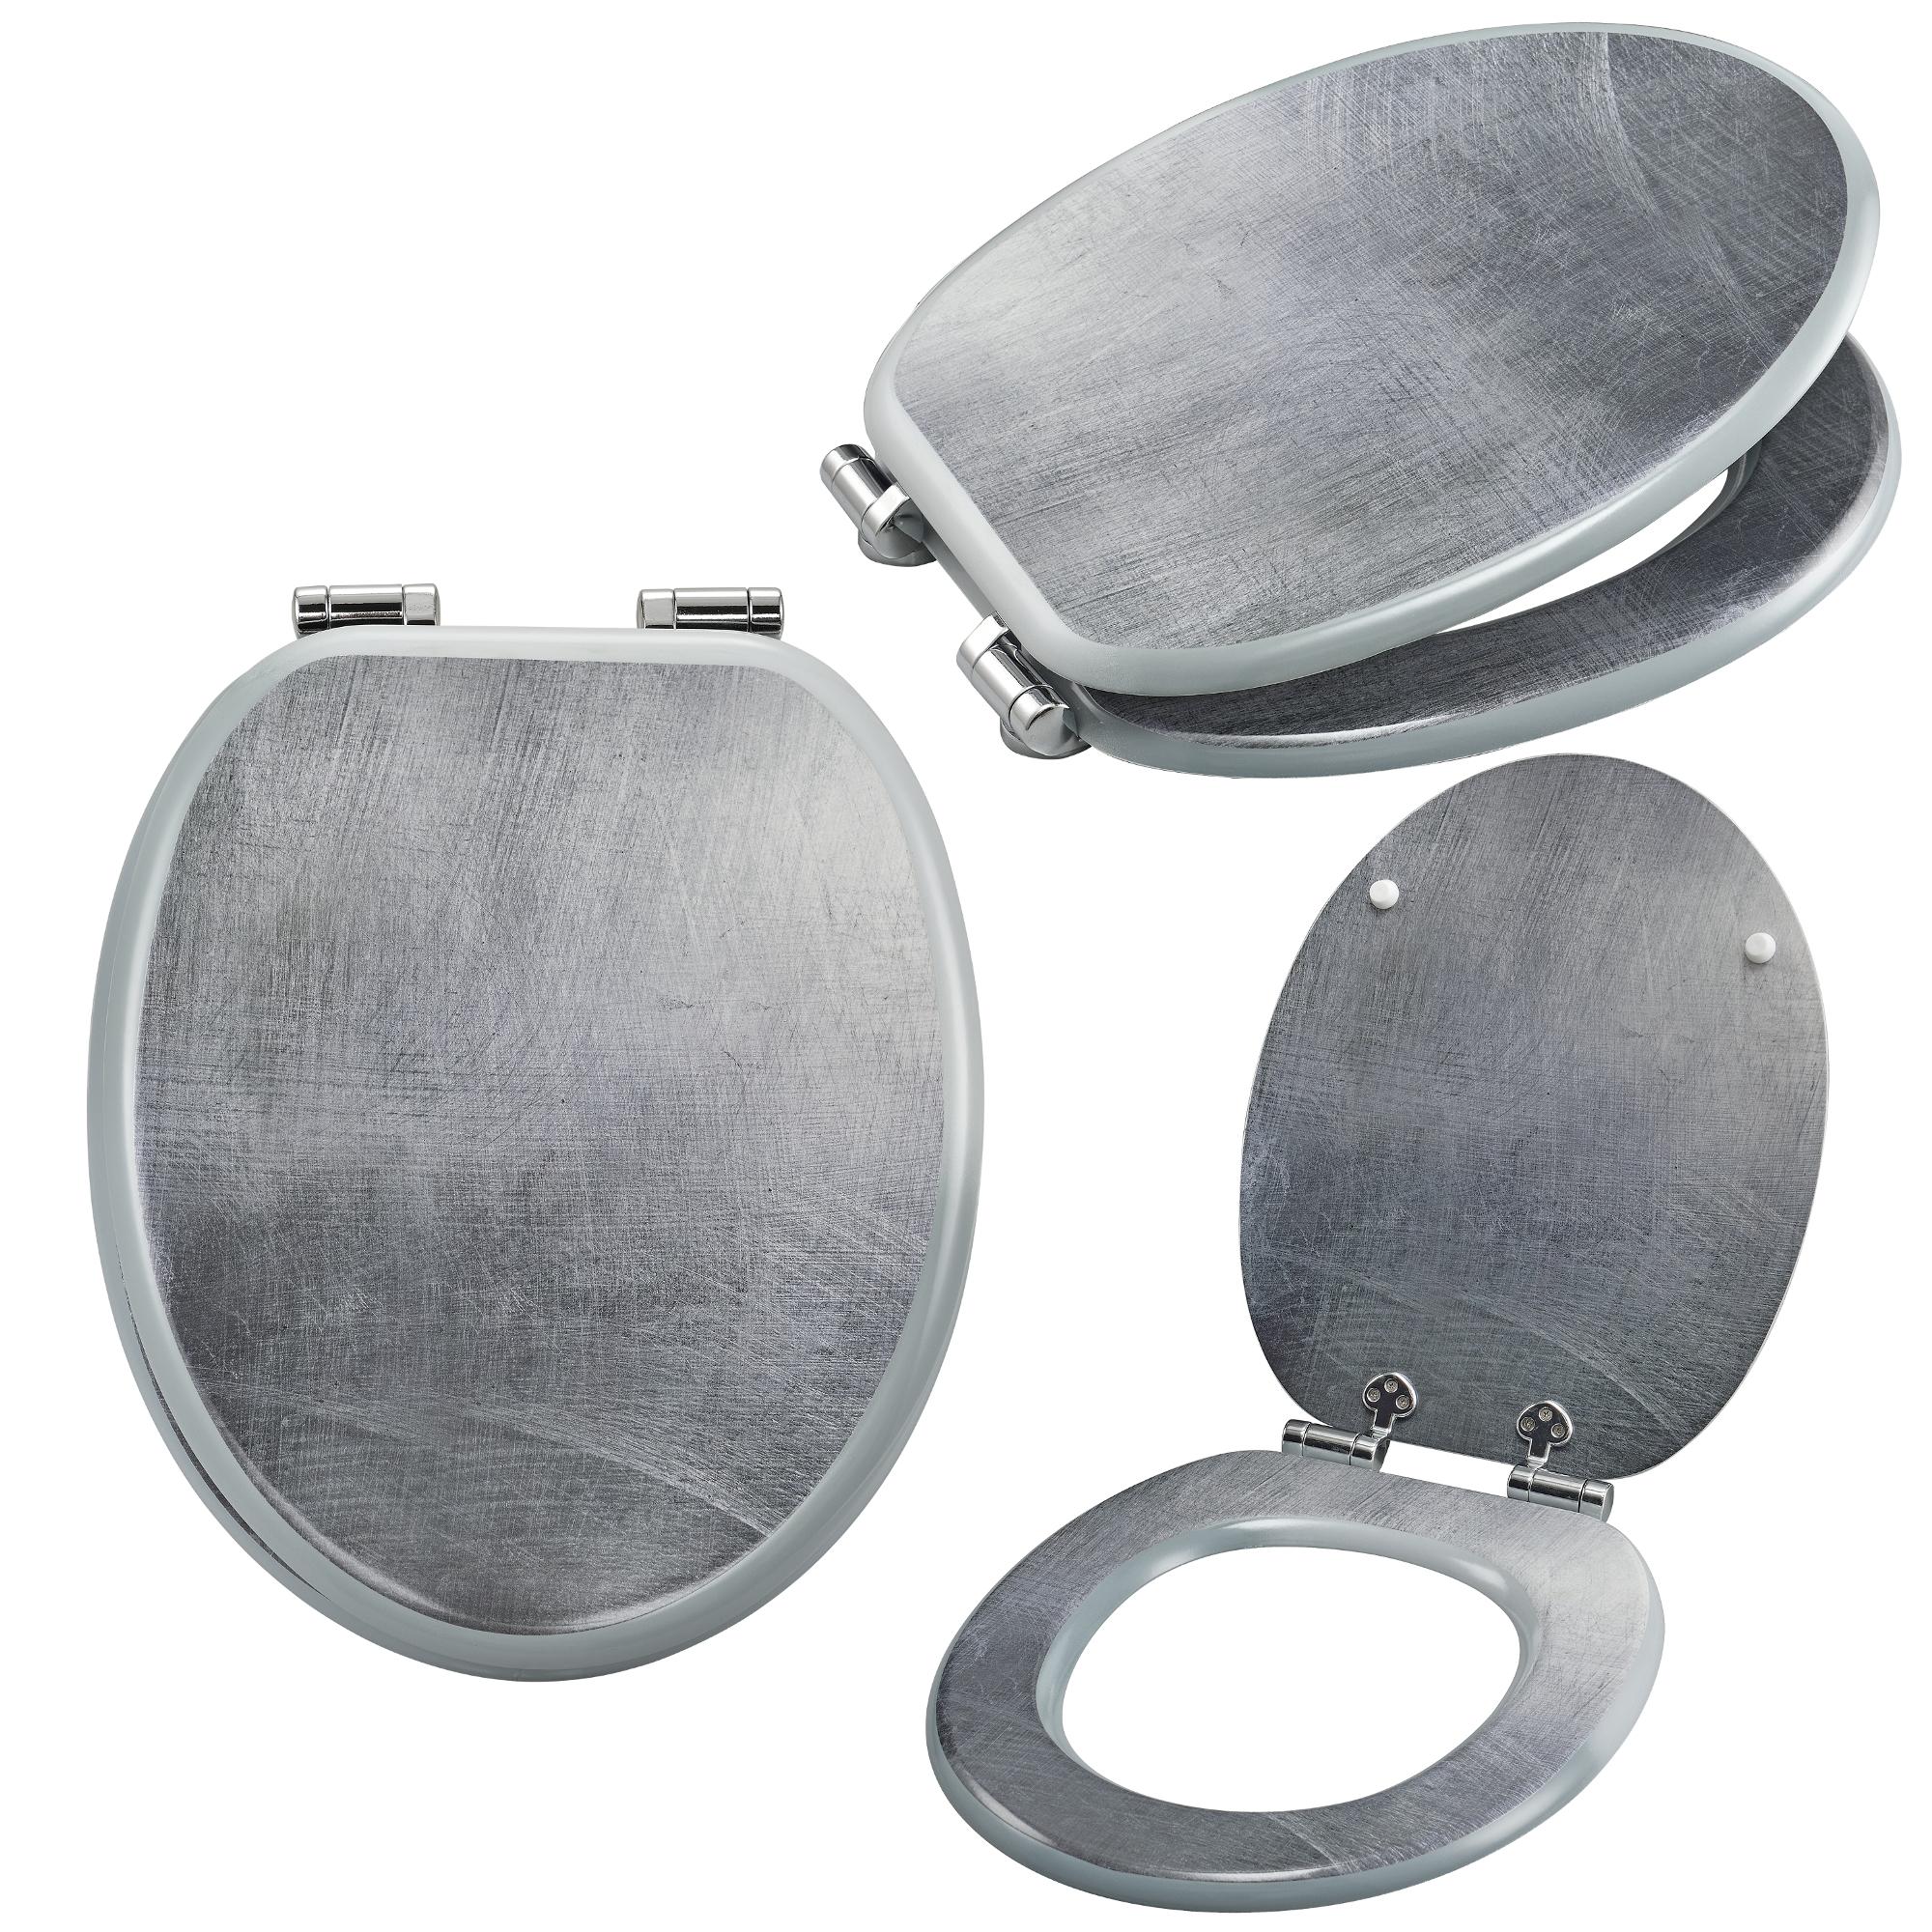 toilettensitz absenkautomatik wc sitz. Black Bedroom Furniture Sets. Home Design Ideas